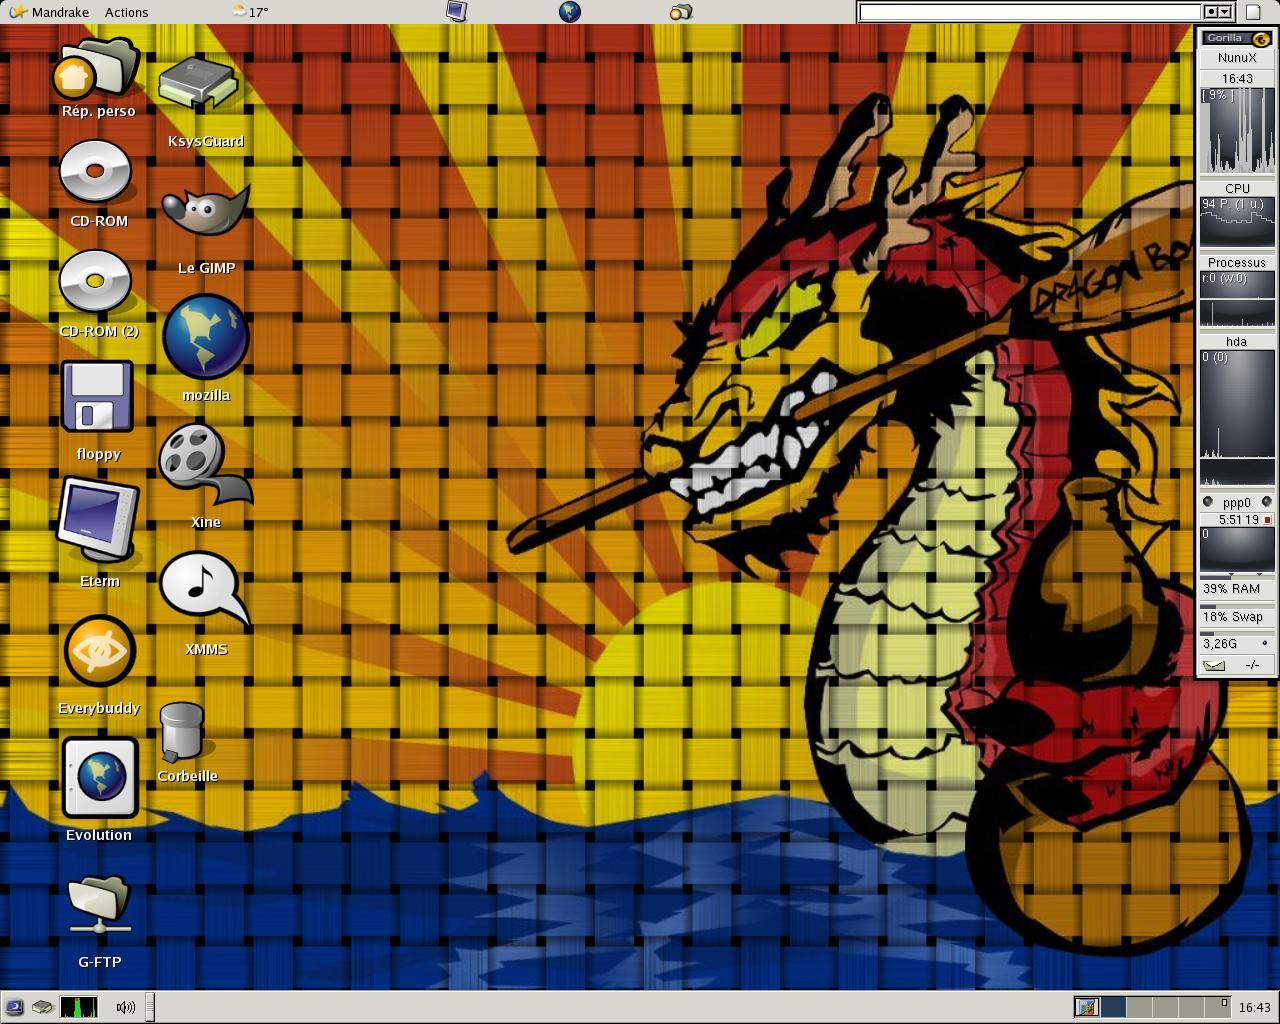 http://xpoulet.free.fr/linux/capture26.jpg